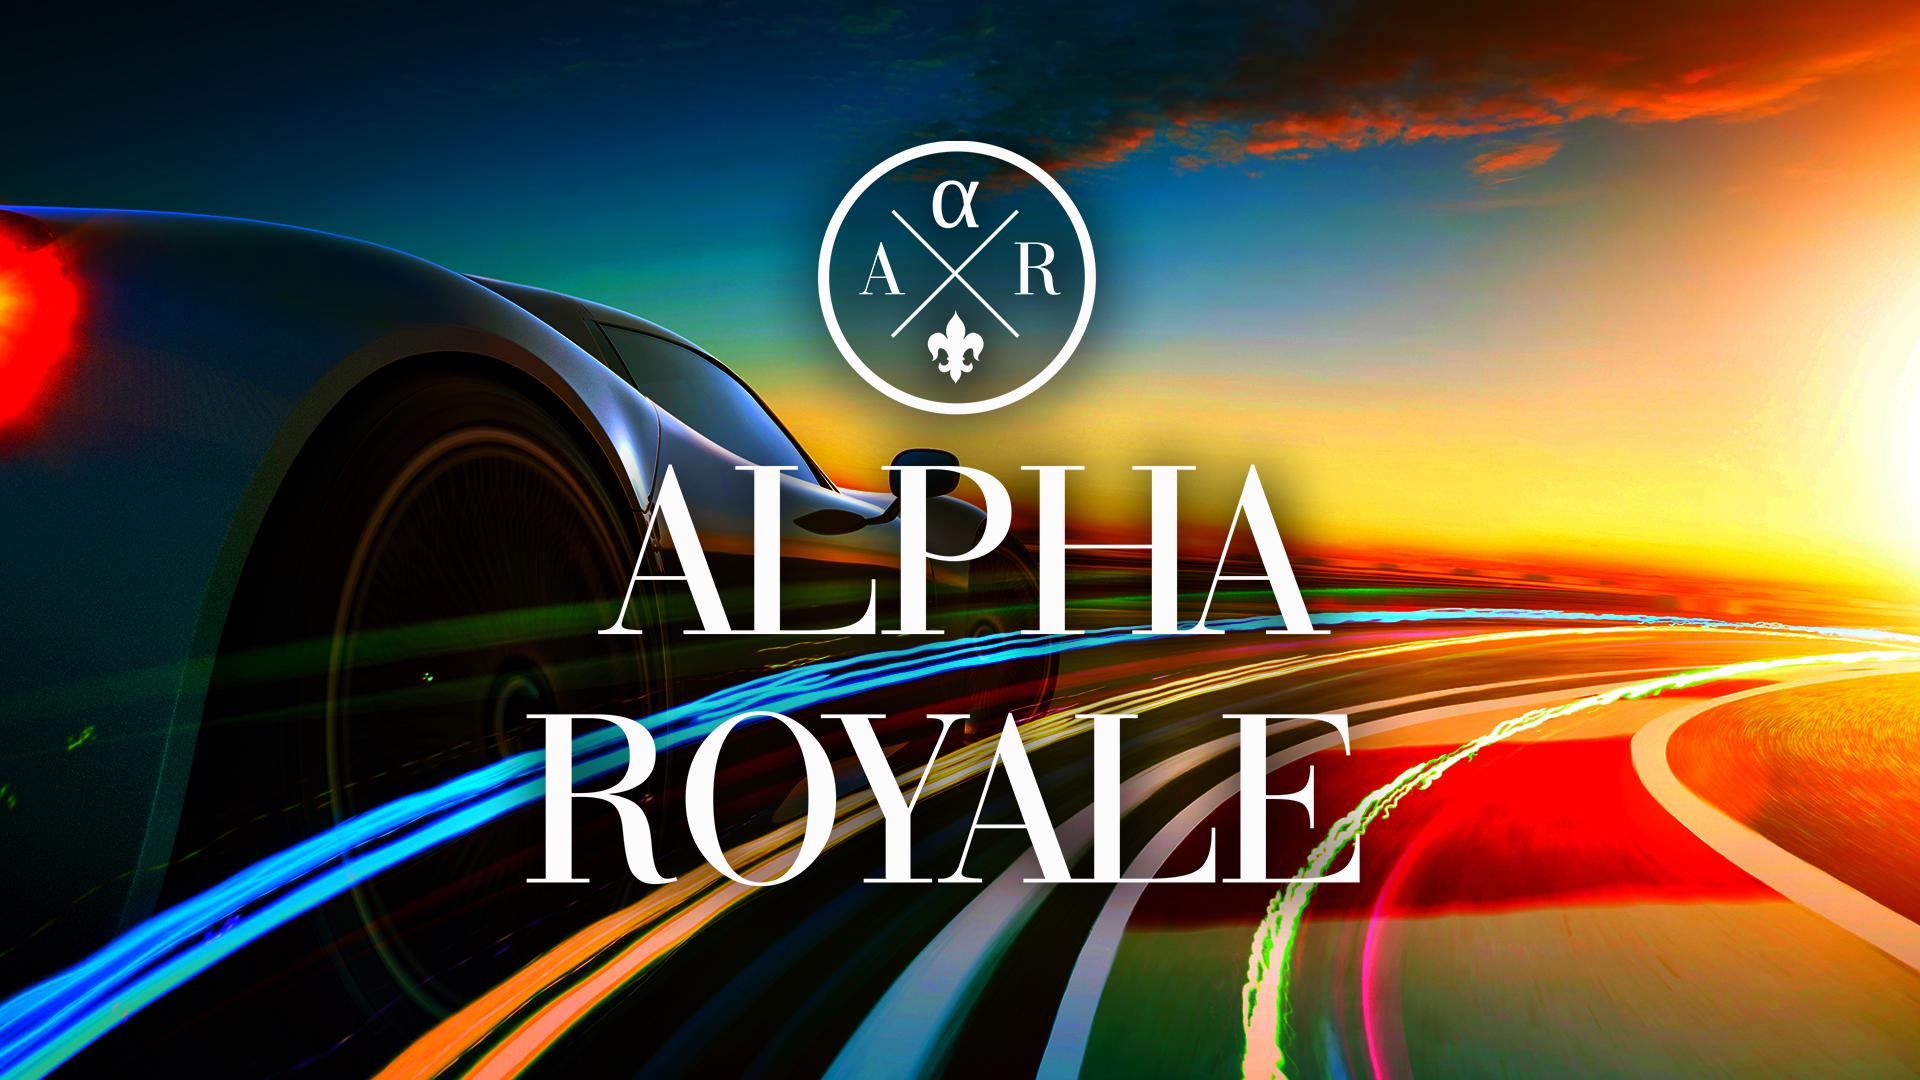 Web banner - Alpha Royale 2020